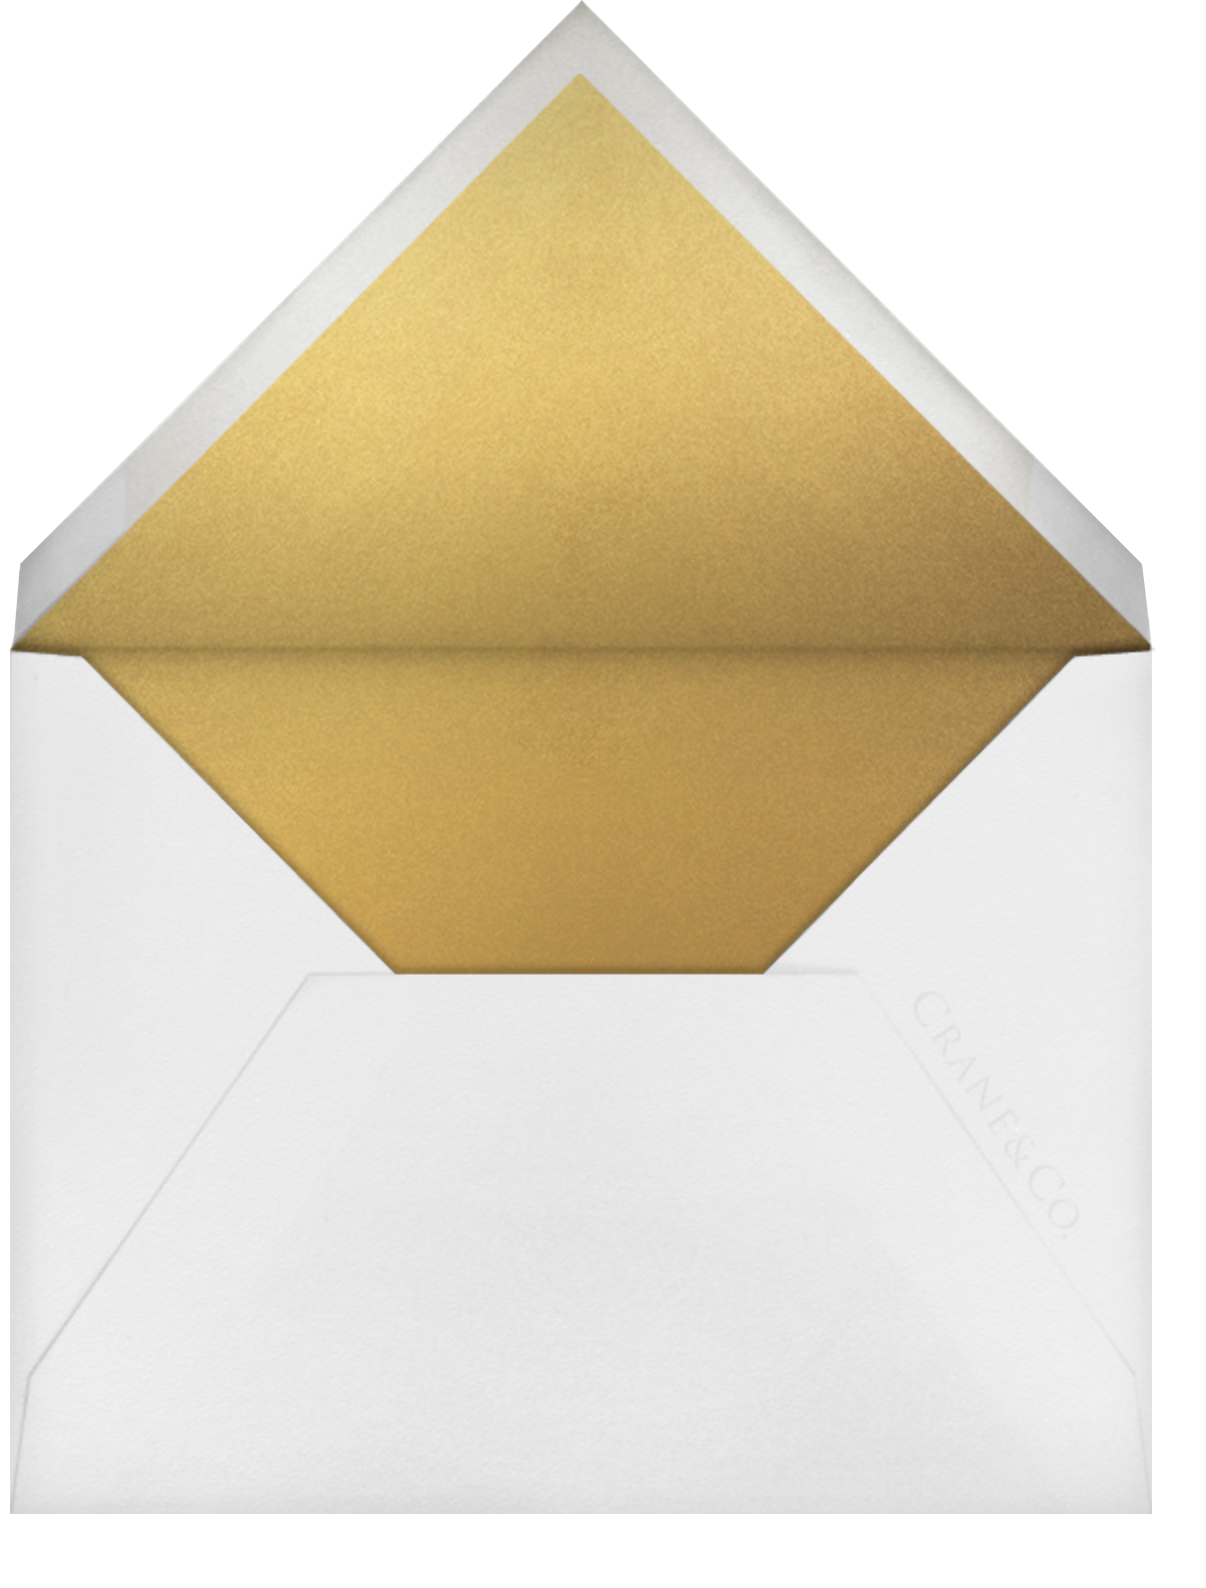 Bauhaus - Medium Gold and Black - Crane & Co. - All - envelope back